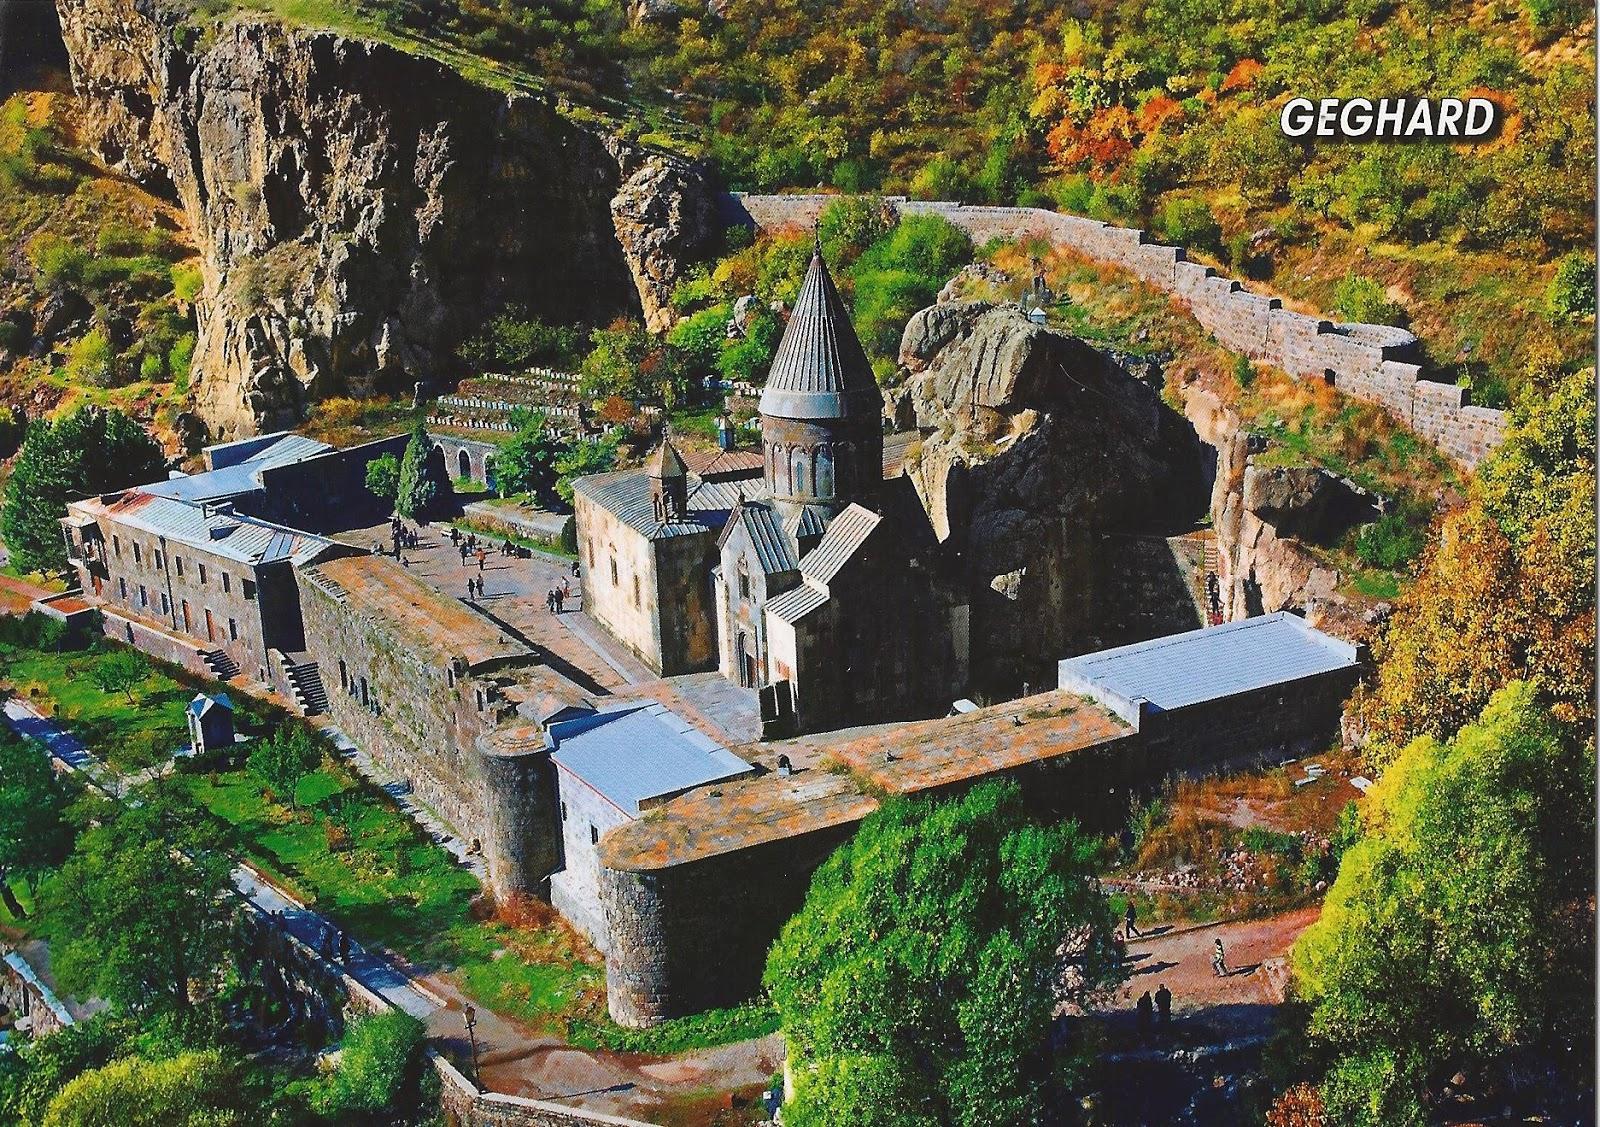 A Journey of Postcards: Geghard monastery  Armenia